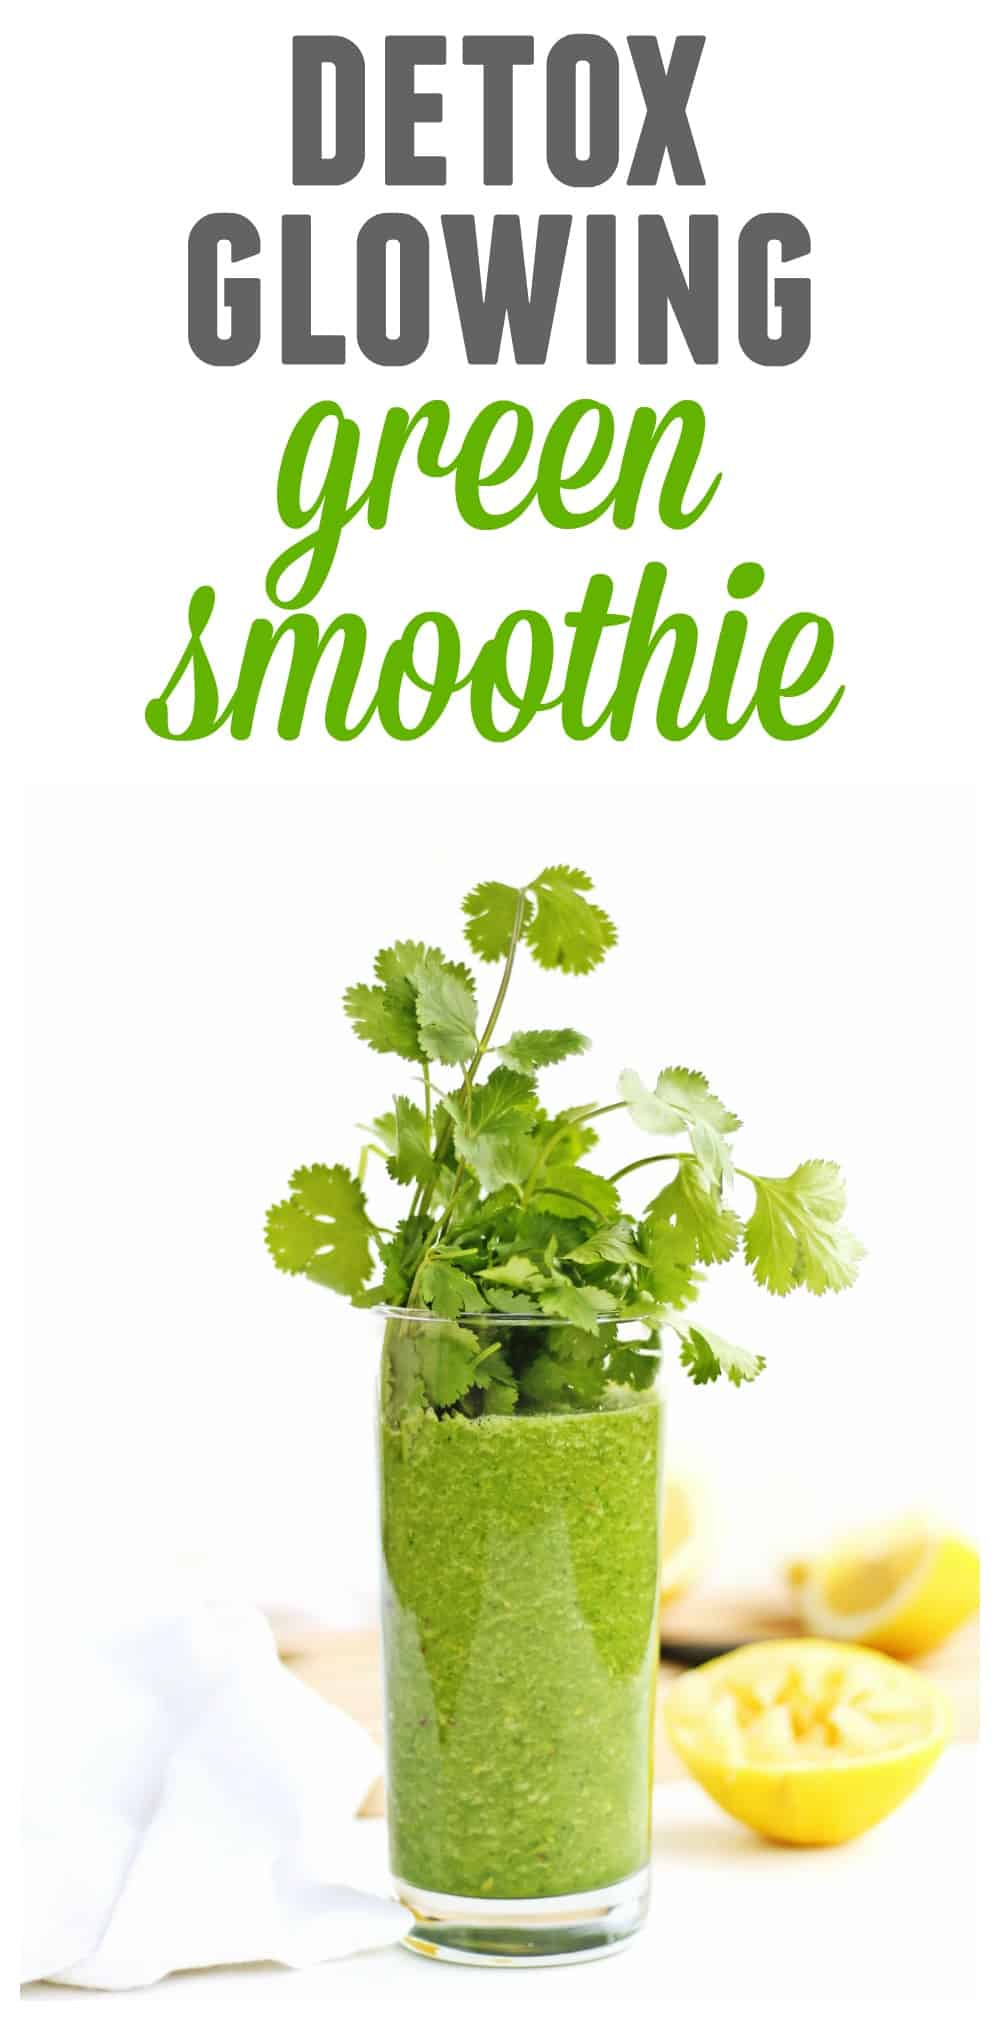 Glowing green detox smoothie recipe! // Rhubarbarians // Green smoothie / Heavy metal detox / Alkalizing smoothie / Cleansing / Antiaging / Superfood / #greensmoothie #detox #heavymetaldetox #antiaging #superfood #vegan #weightloss